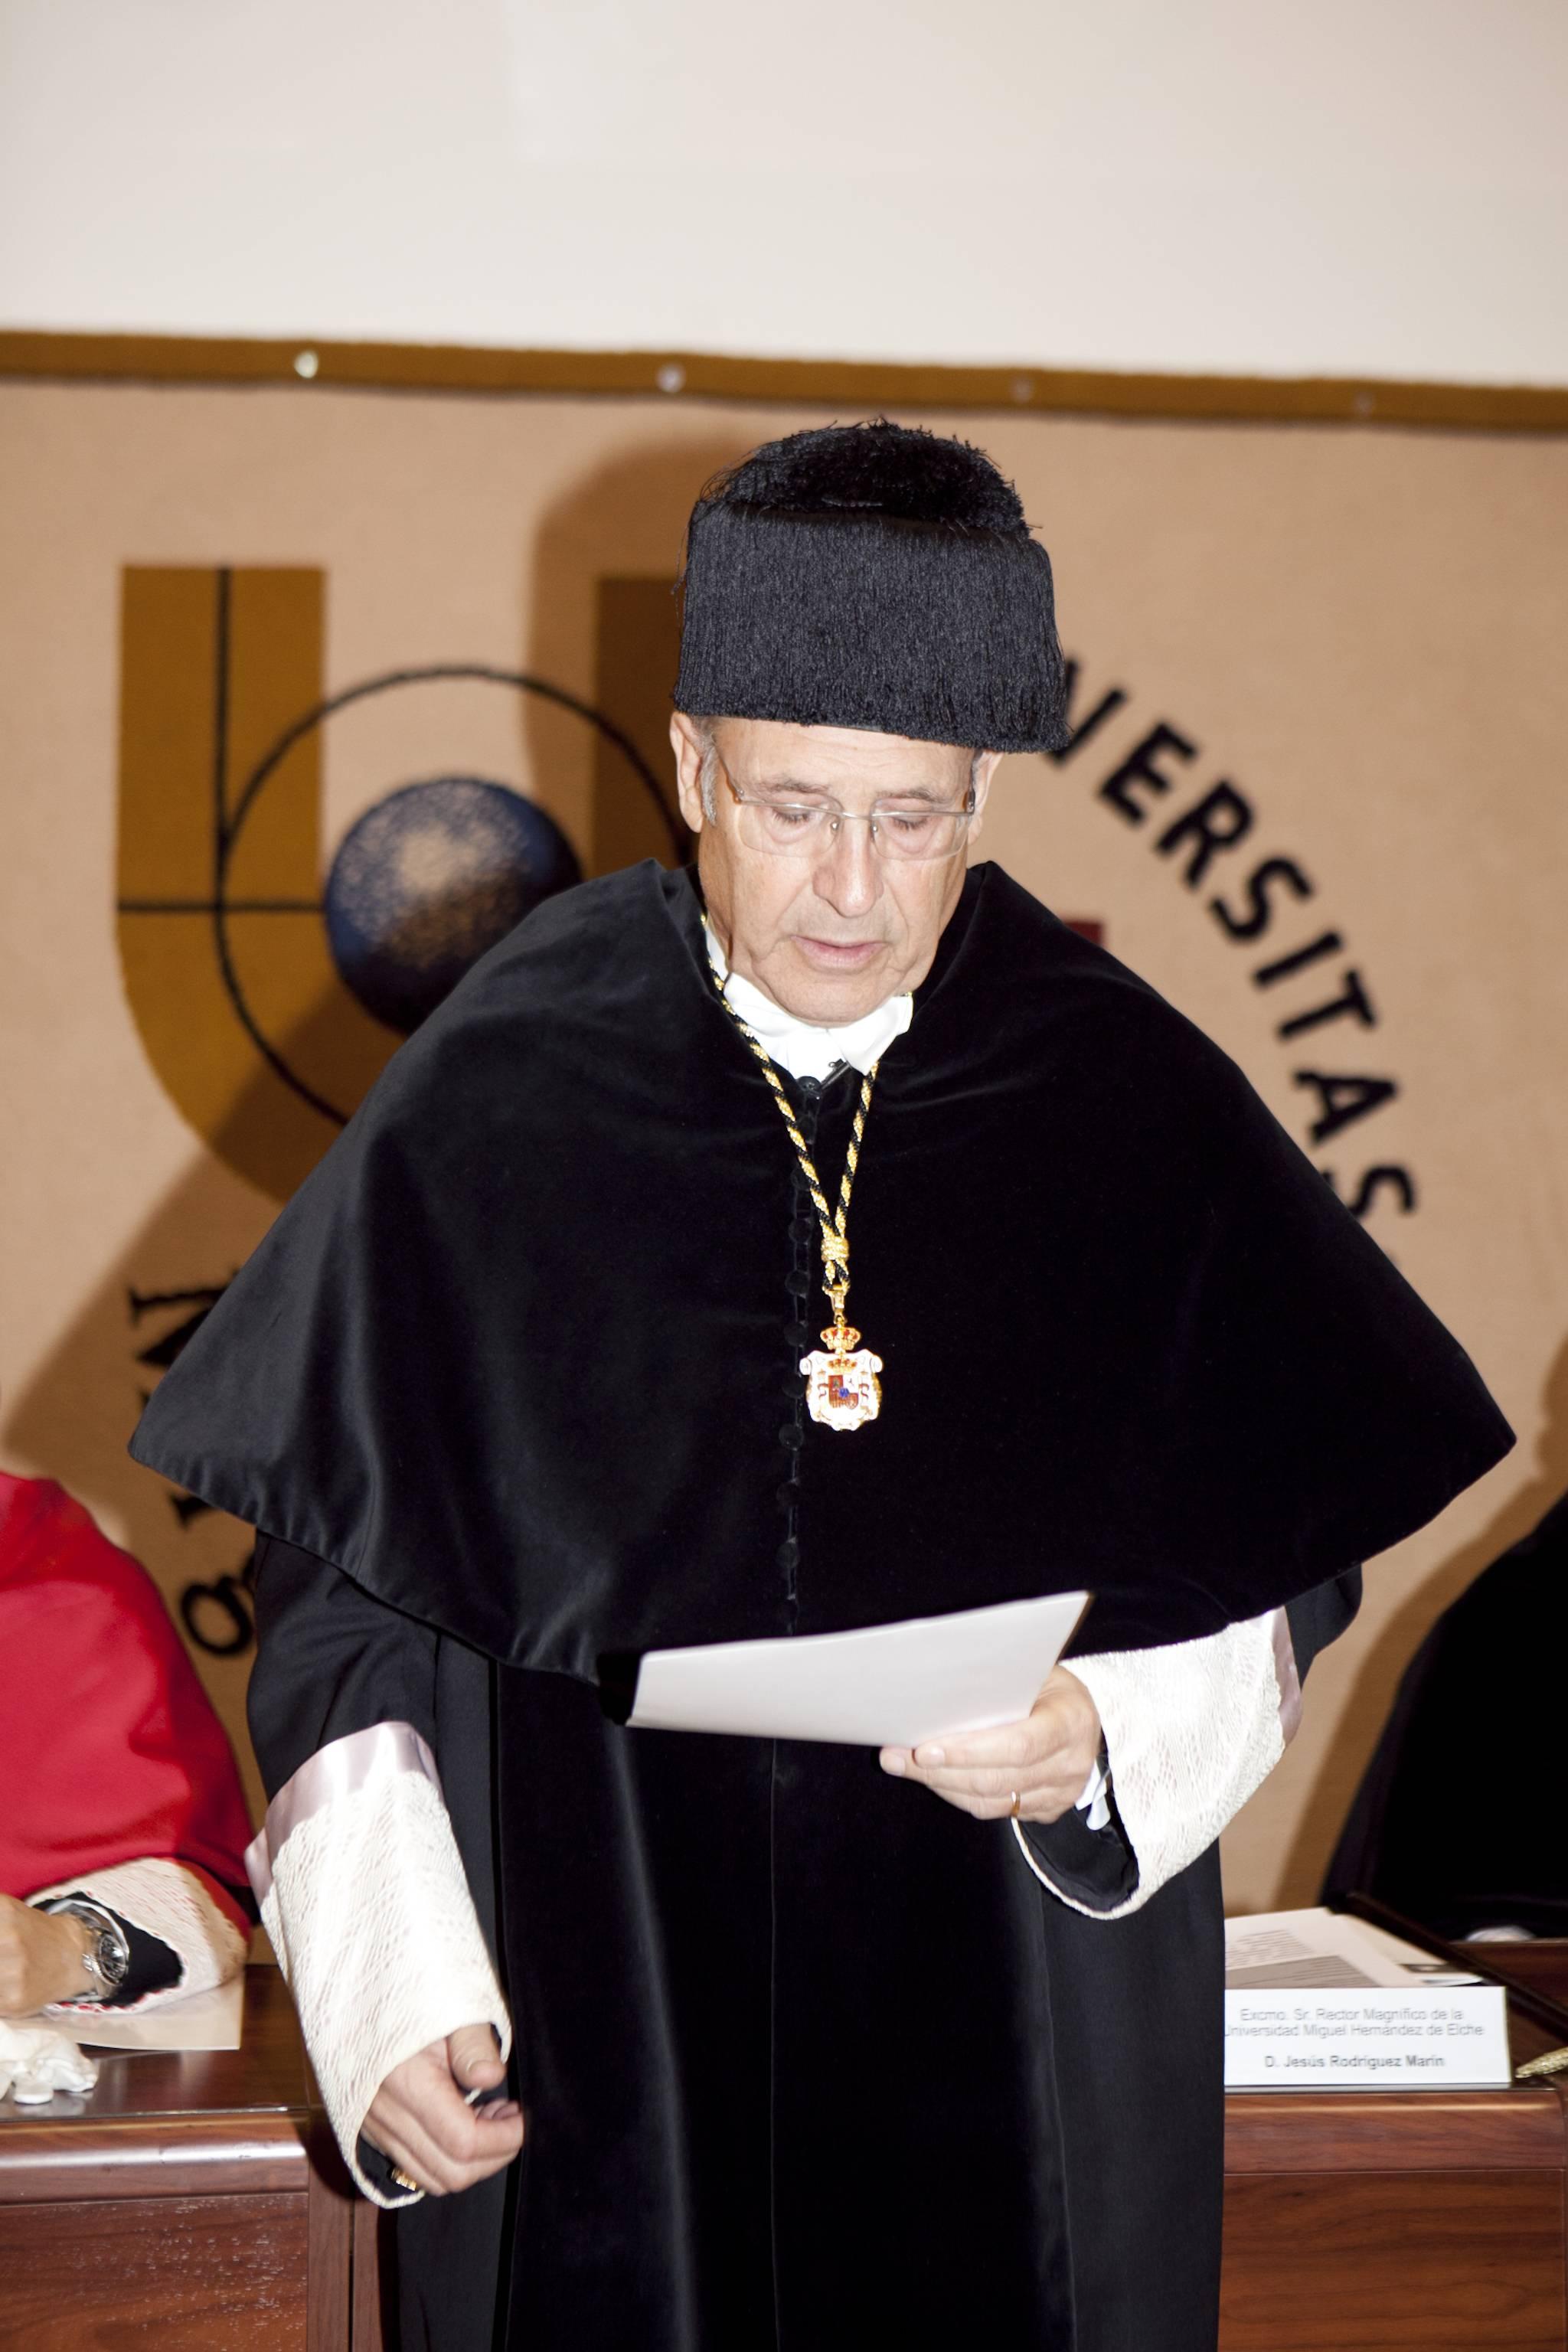 doctor-honoris-causa-luis-gamir_mg_0763.jpg